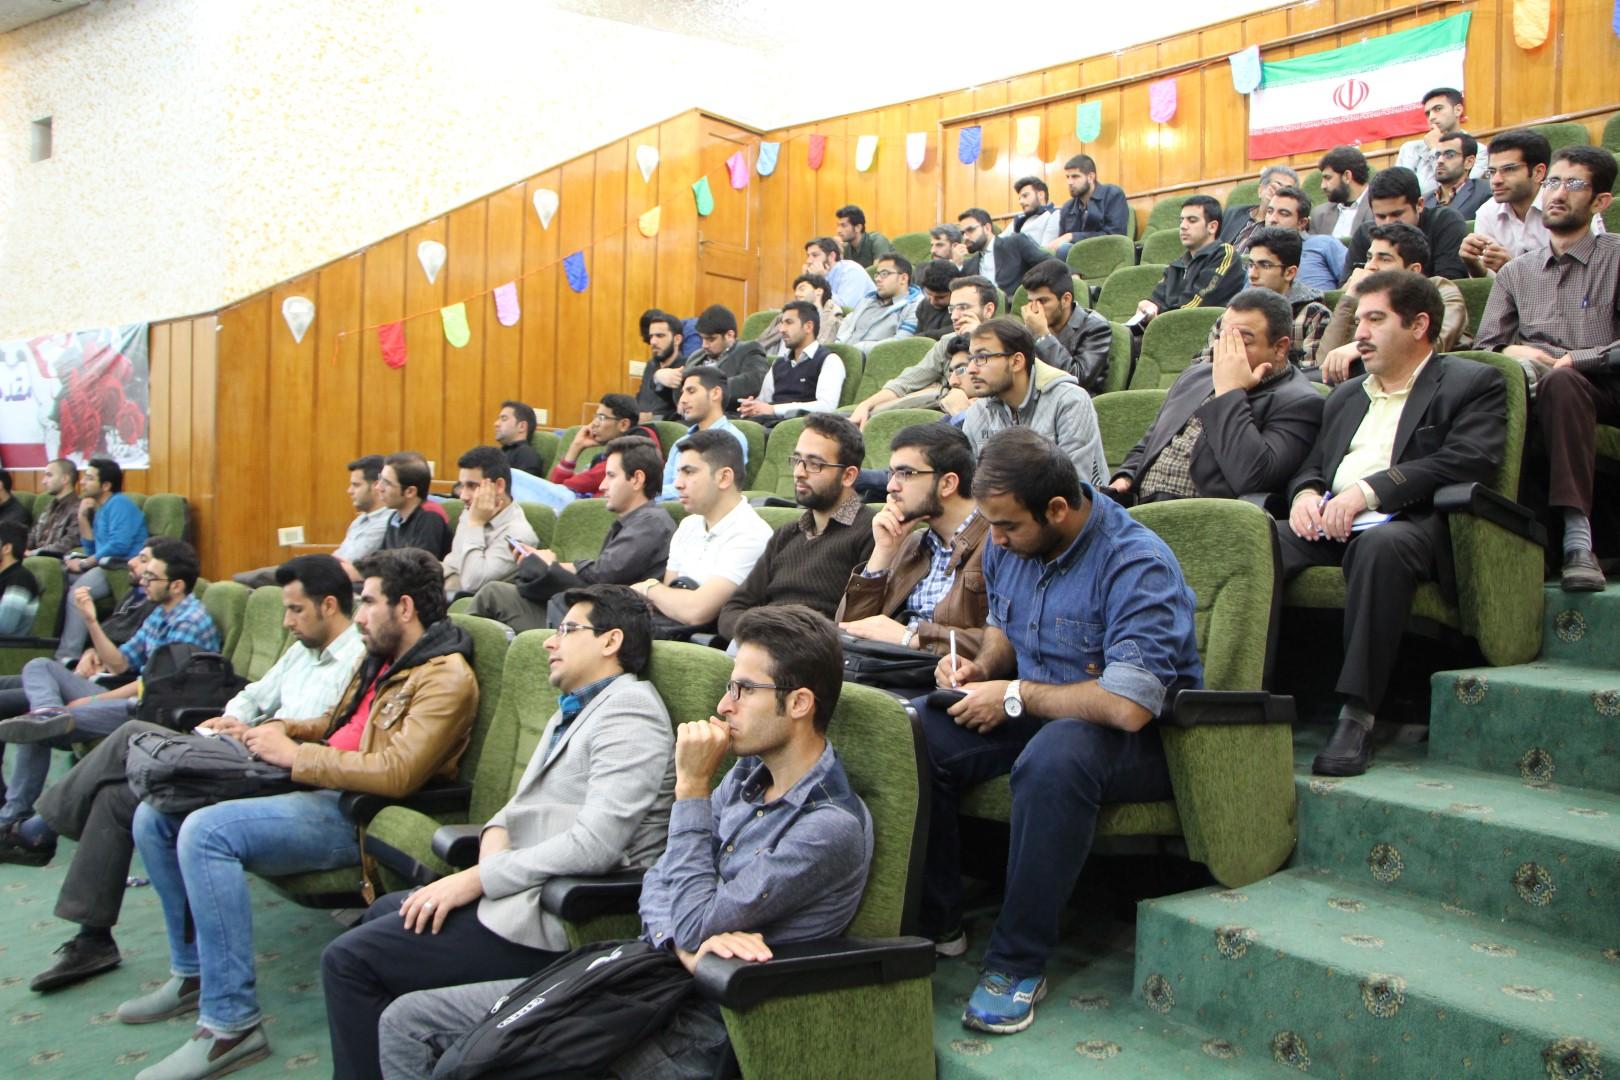 IMG 5280 گزارش تصویری؛ سخنرانی استاد حسن عباسی با موضوع از چوئن لای تا سیاست درهای باز